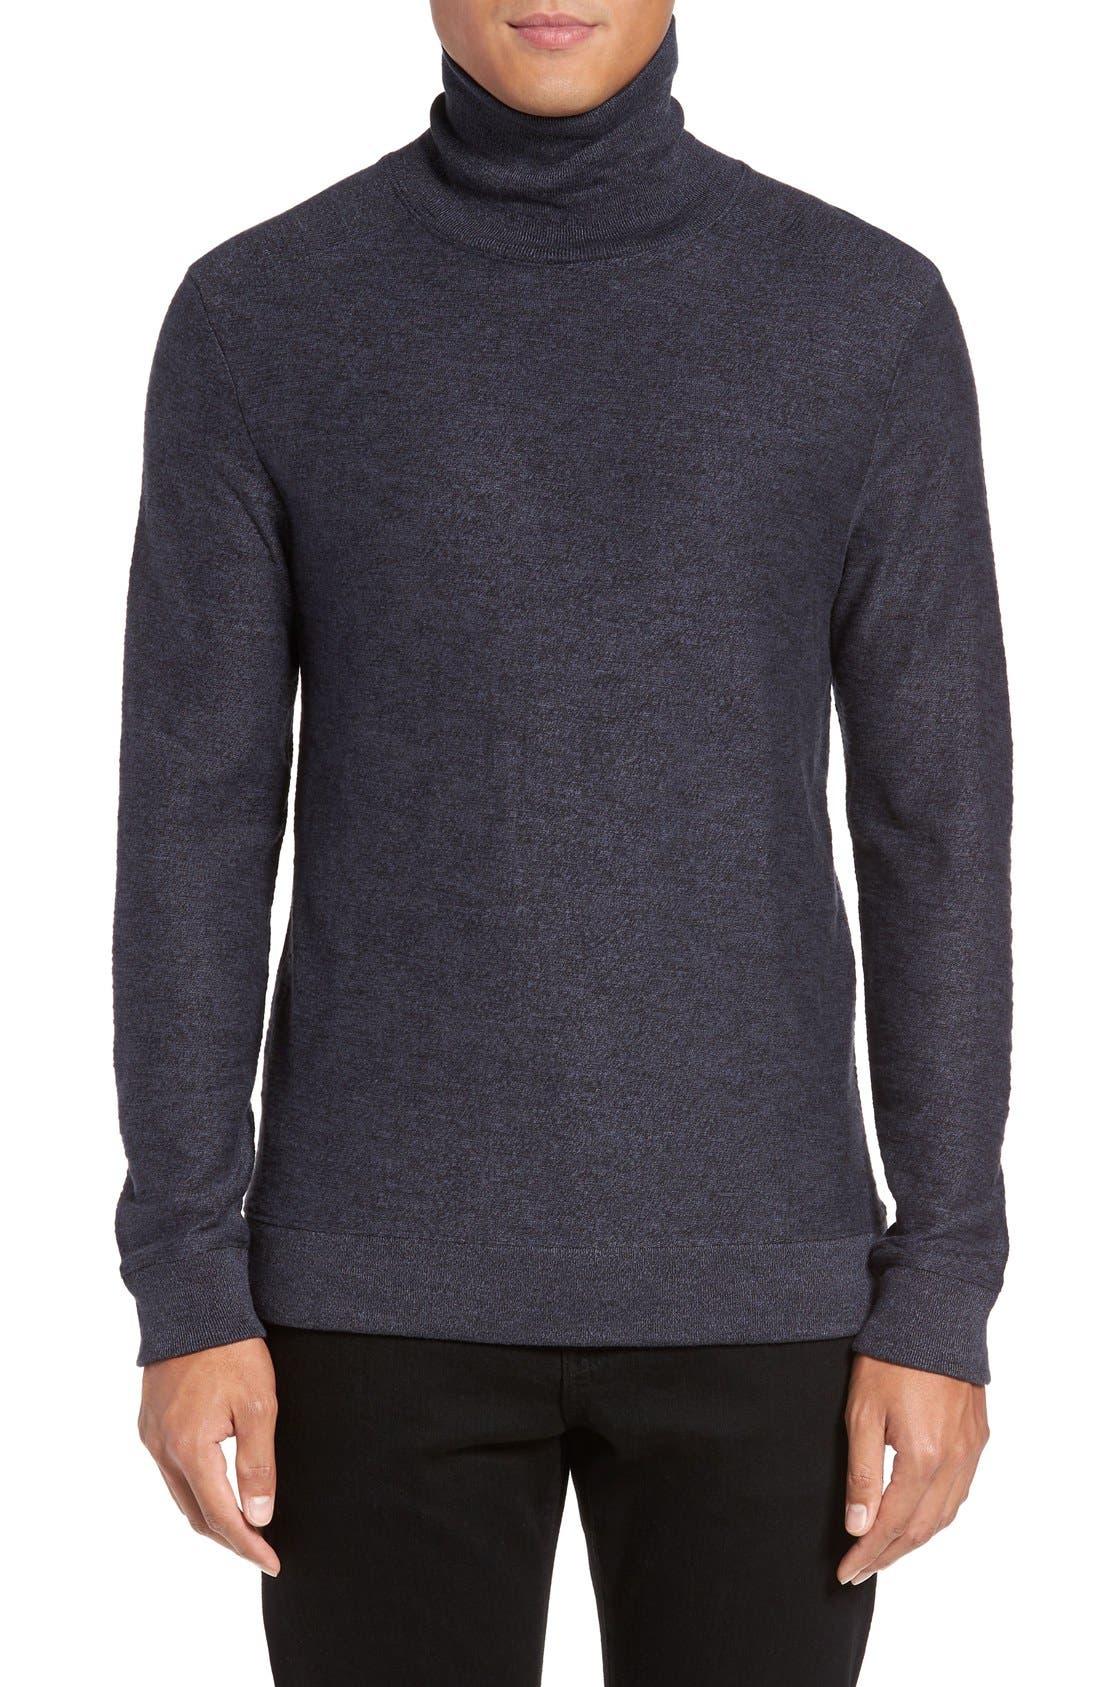 Vince Camuto Turtleneck Sweater